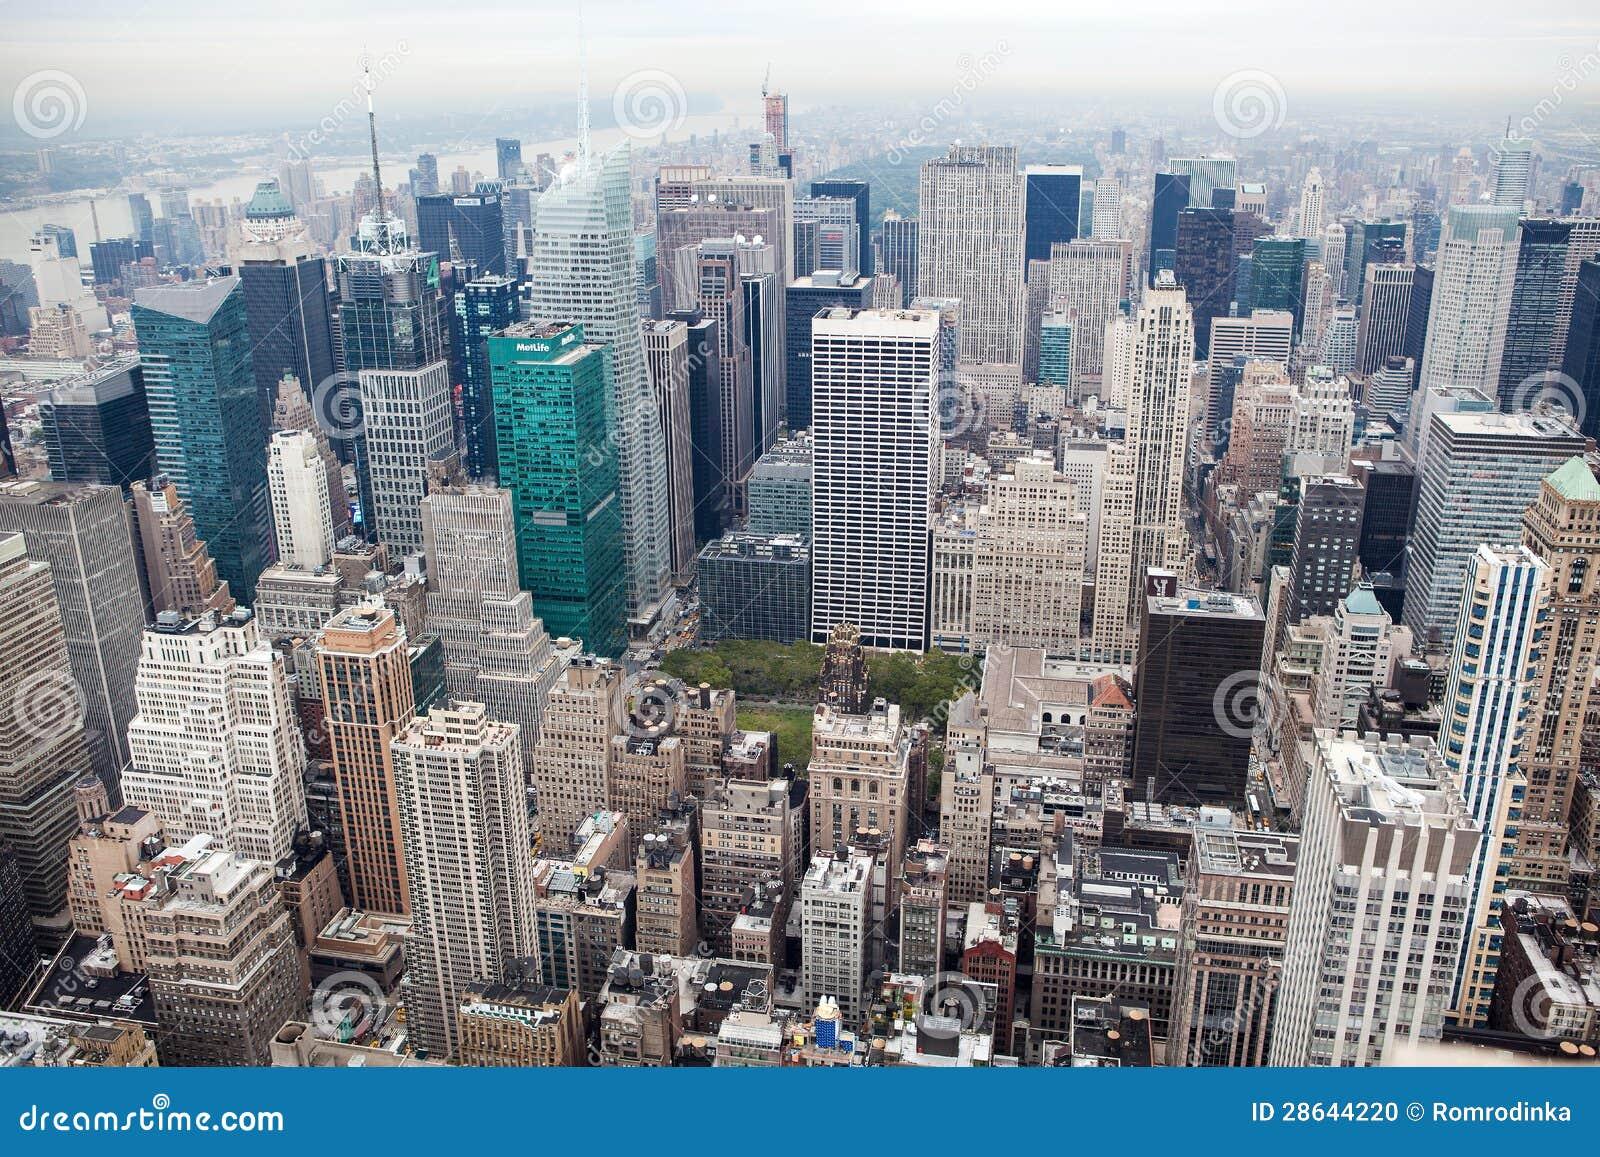 new york skyline view - photo #34